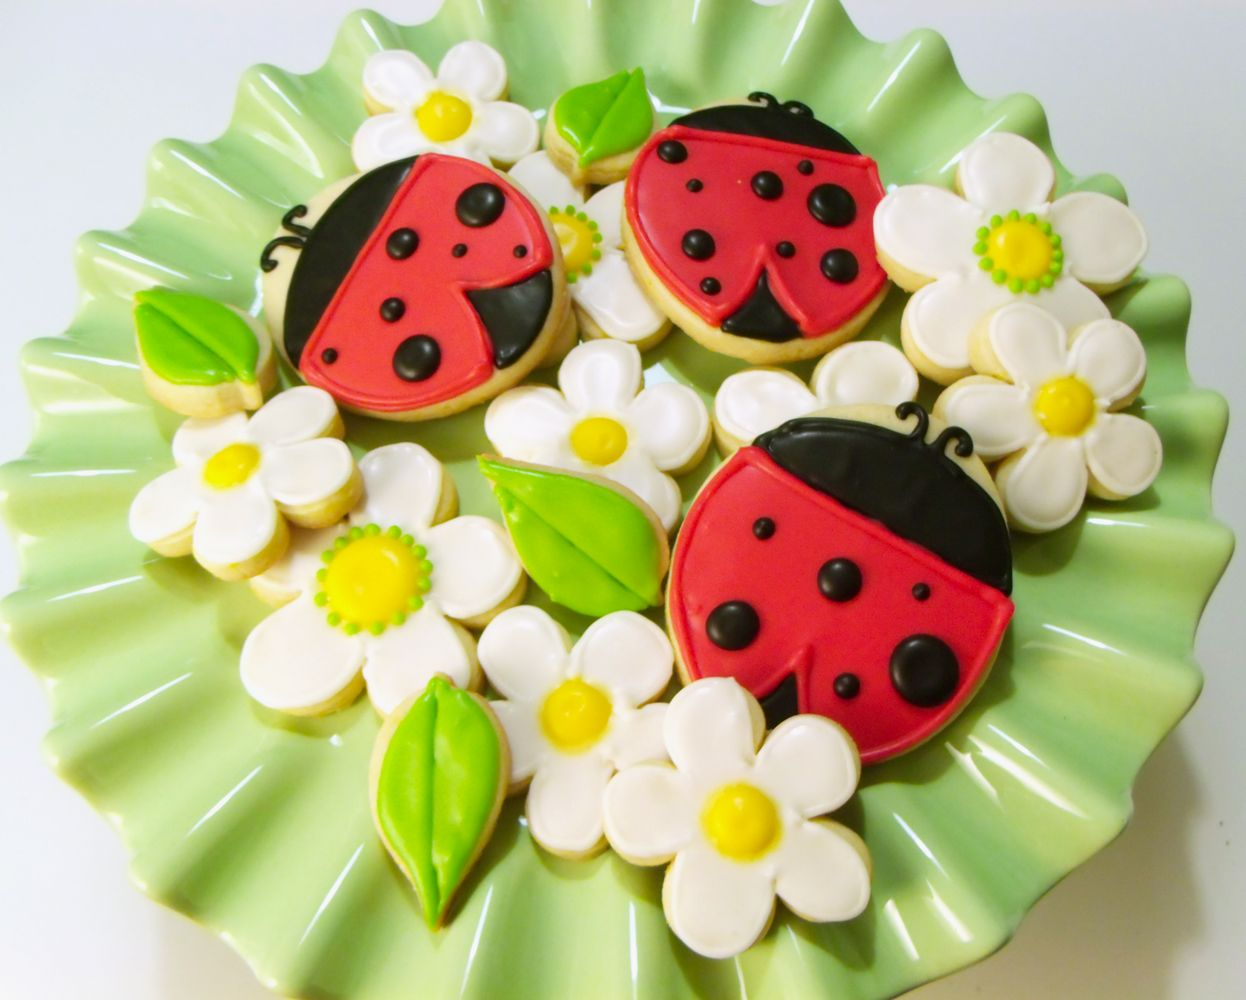 Titti Cake Studio: Ladybugs and Flowers